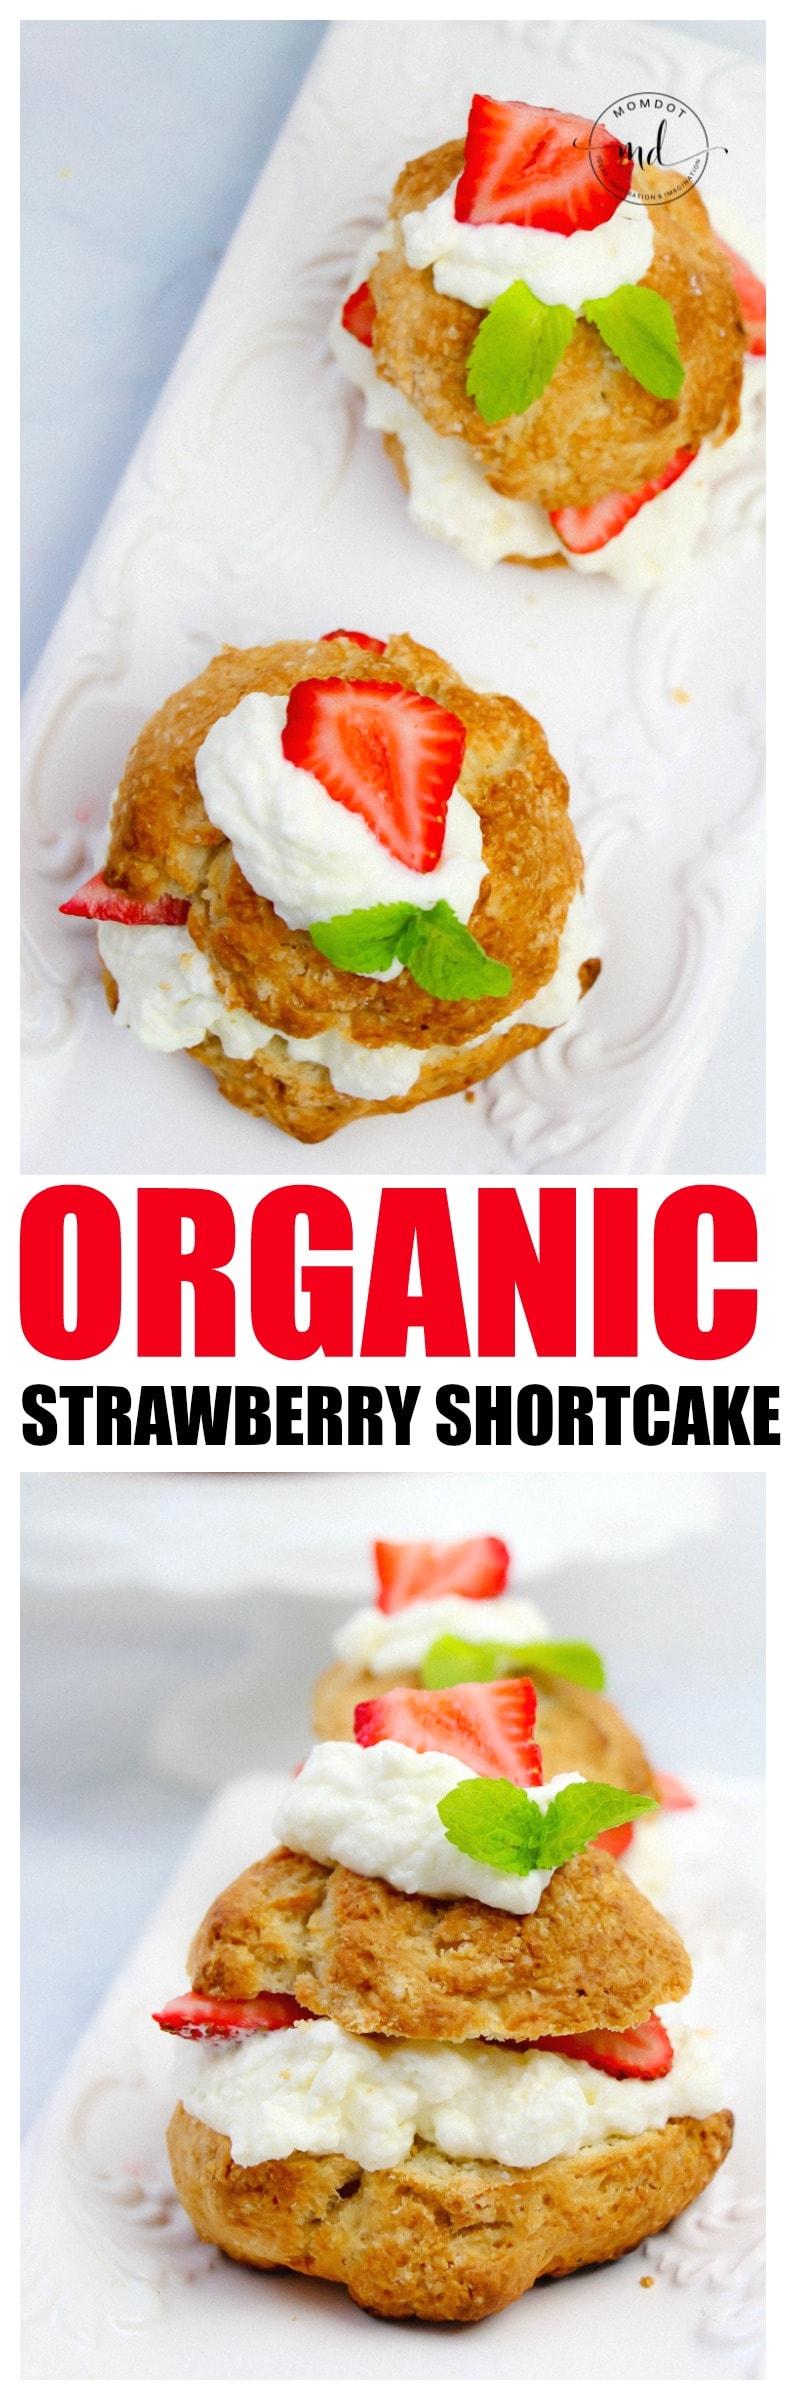 Simple Strawberry Shortcake Recipe | Organic Strawberry Short Cake | Dense Cake | Homemade whipped cream and strawberry sauce